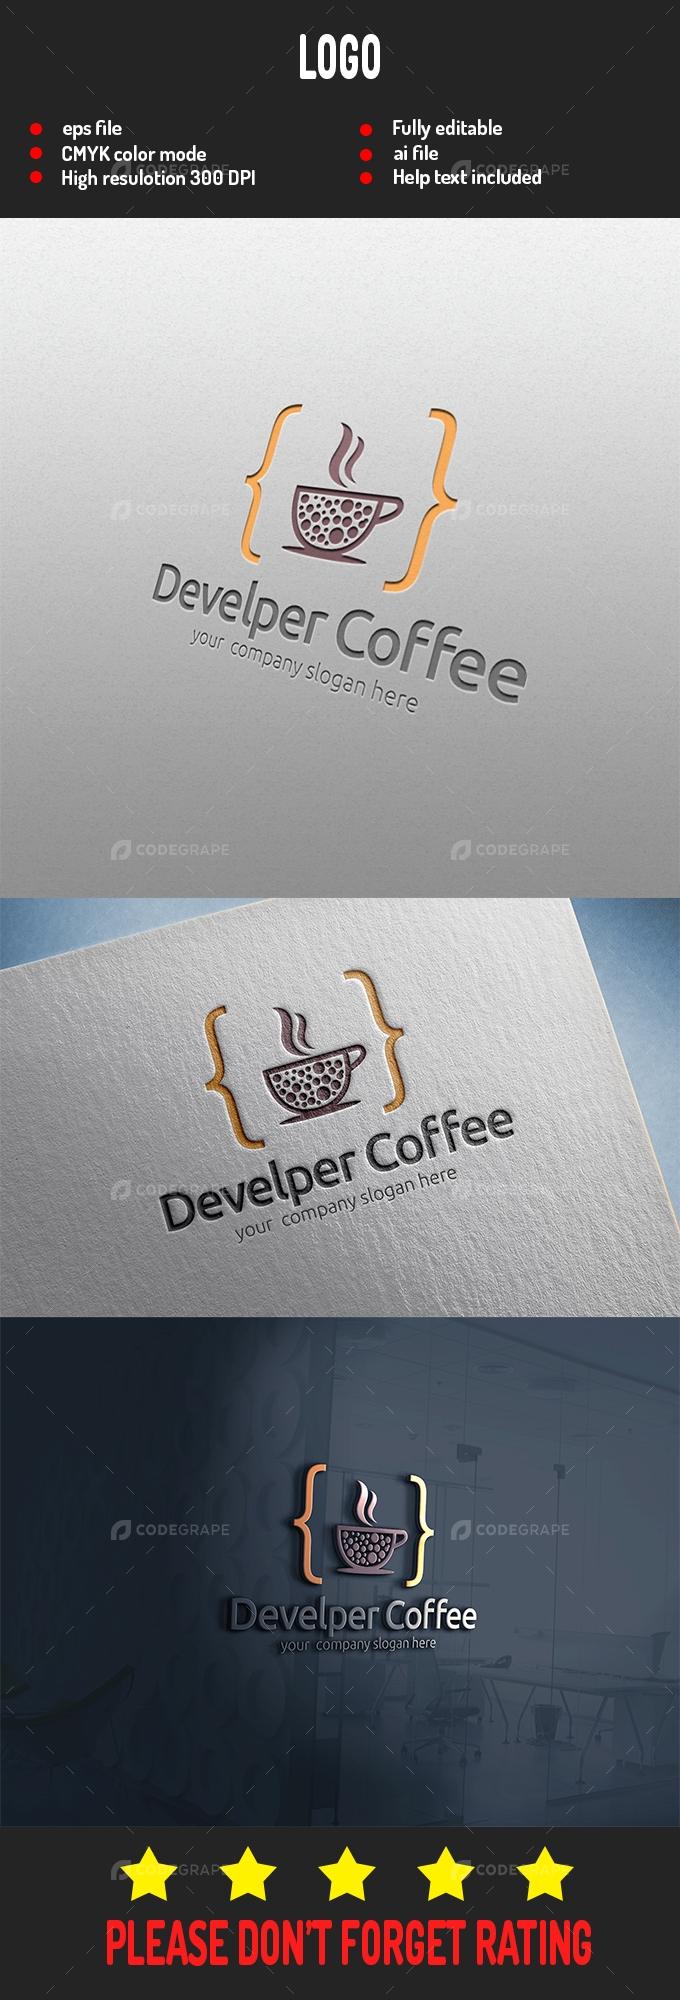 Developer Coffee Logo